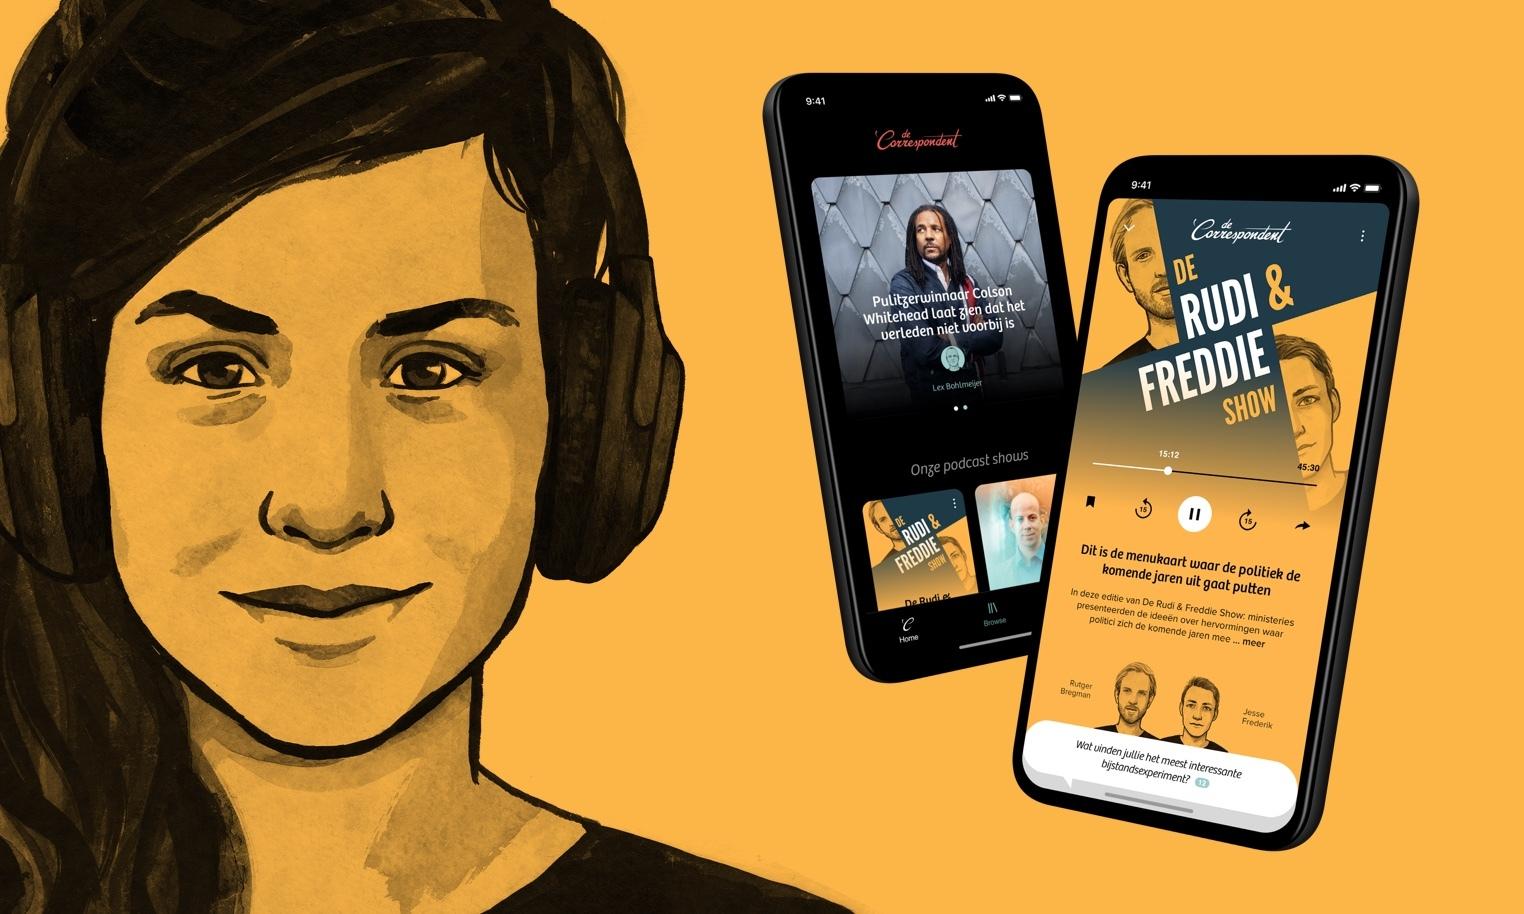 App promotion image